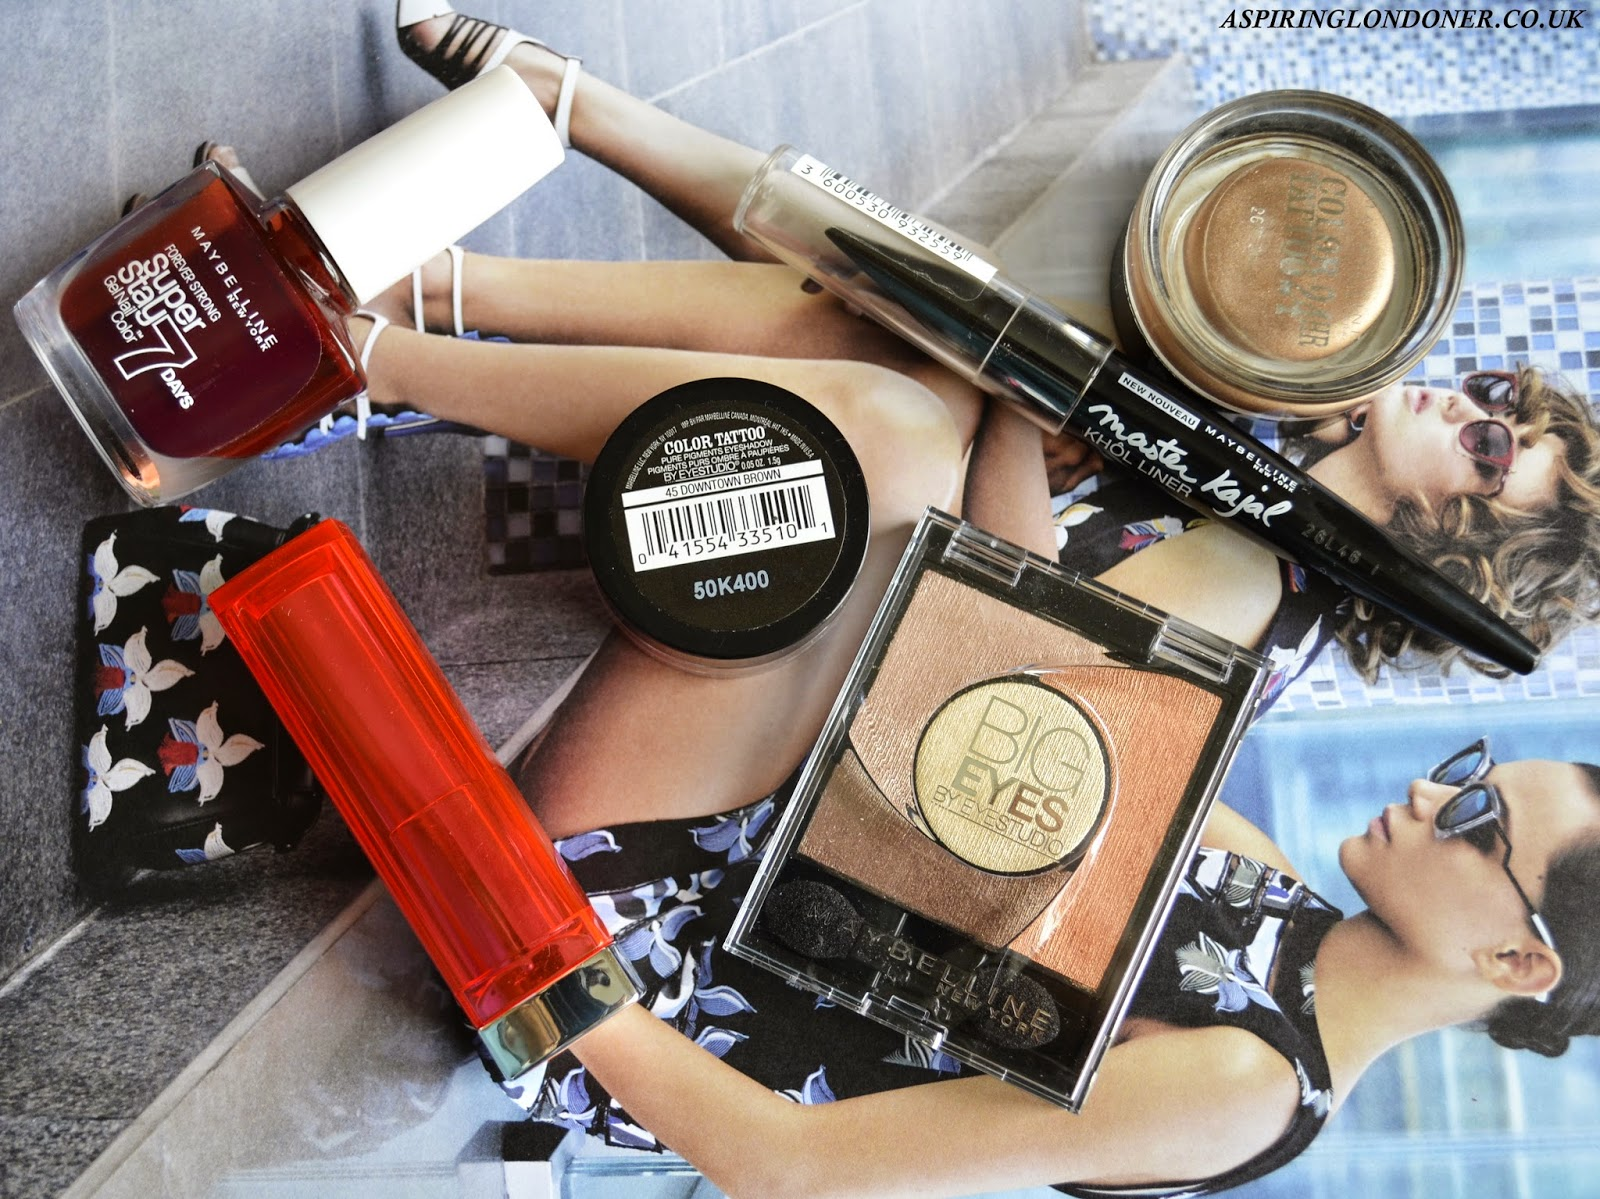 Best of Maybelline Makeup Review - Aspiring Londoner